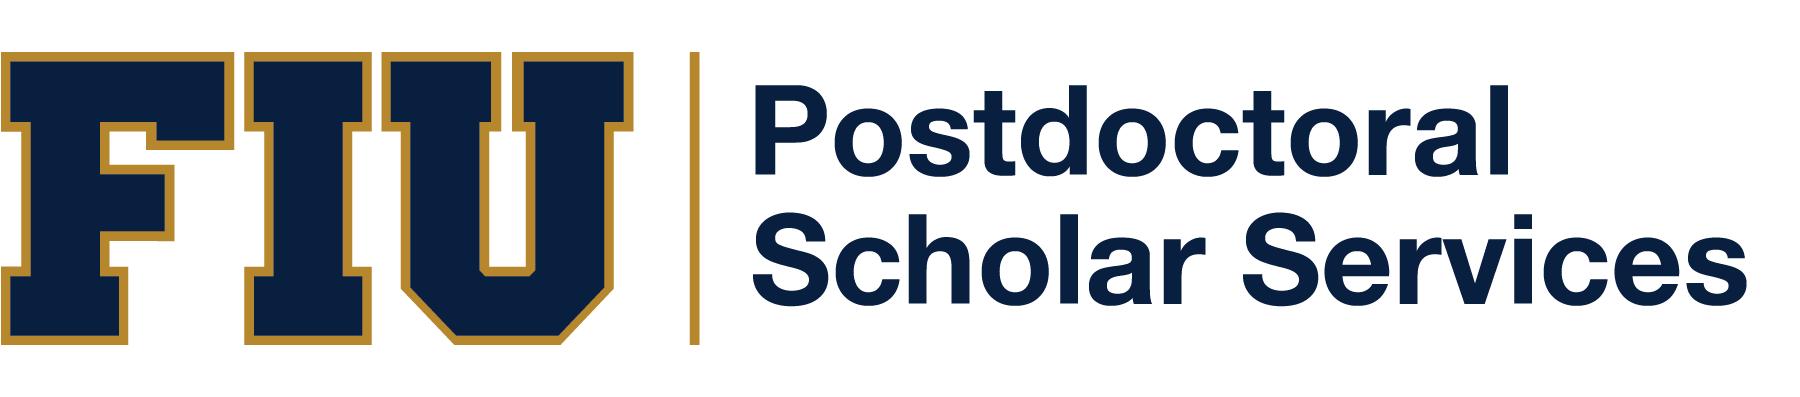 FIU Postdoctoral Scholar Services